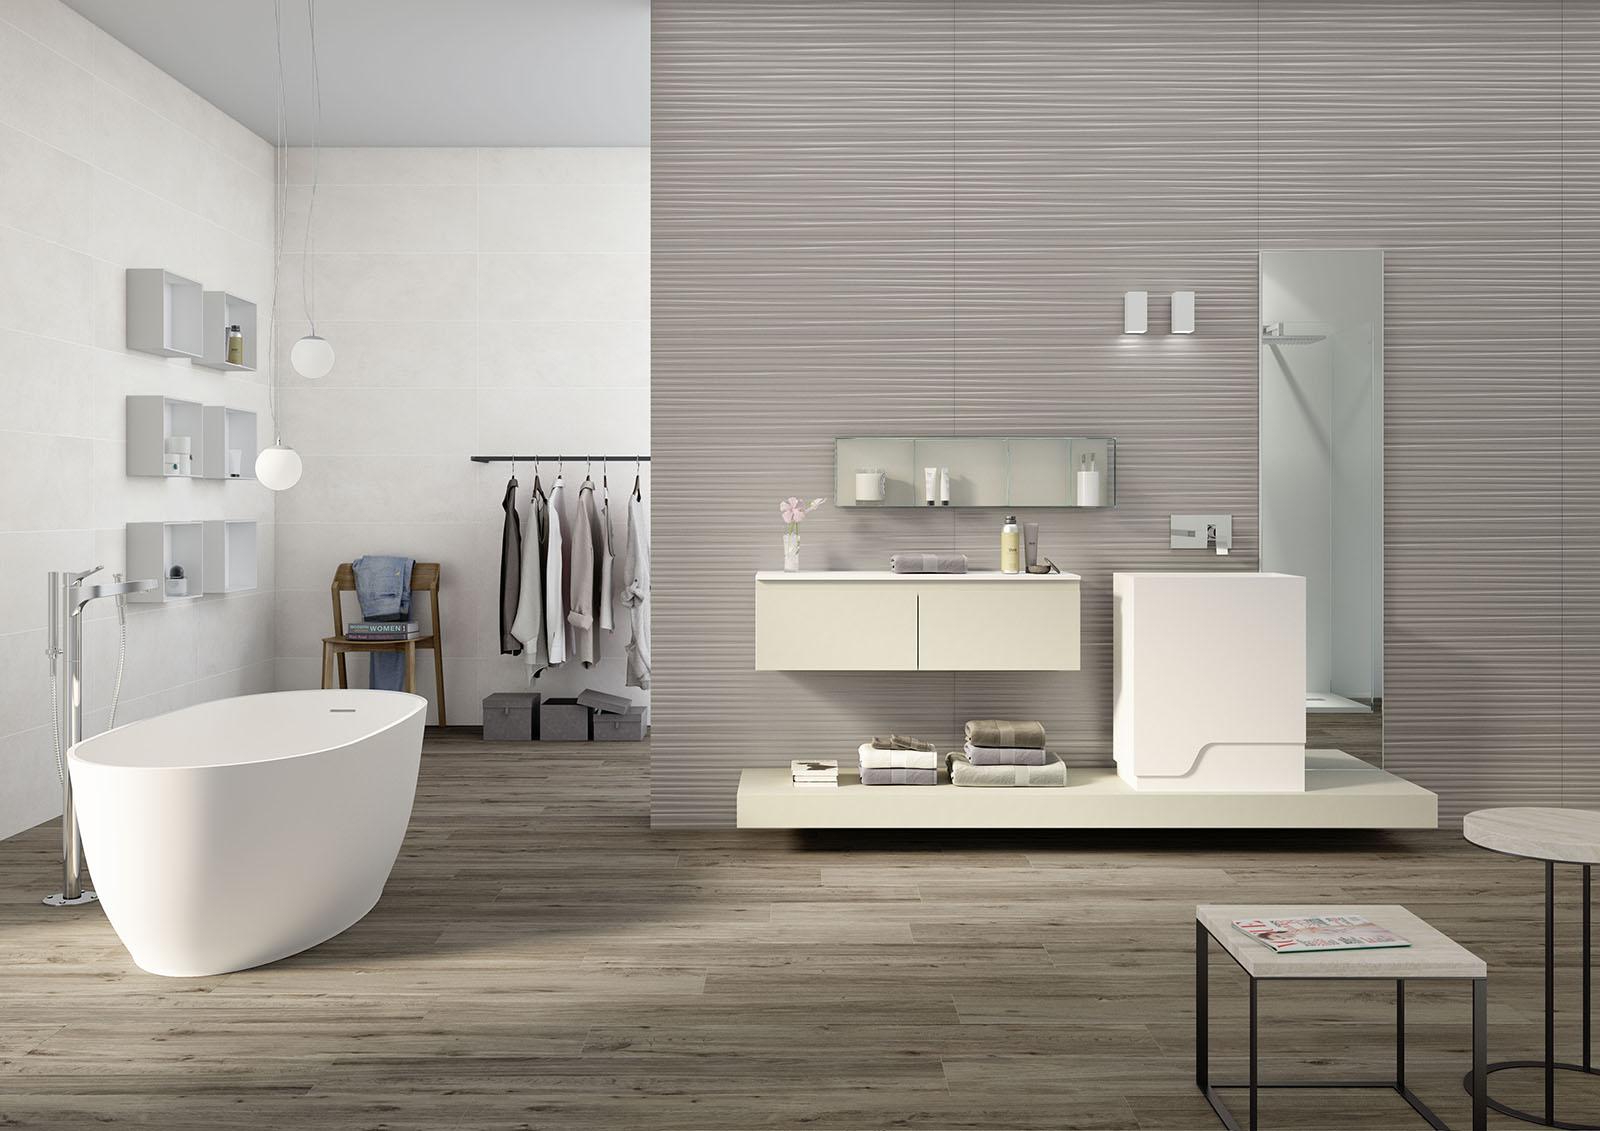 Concreta - Concrete effect porcelain stoneware | Marazzi